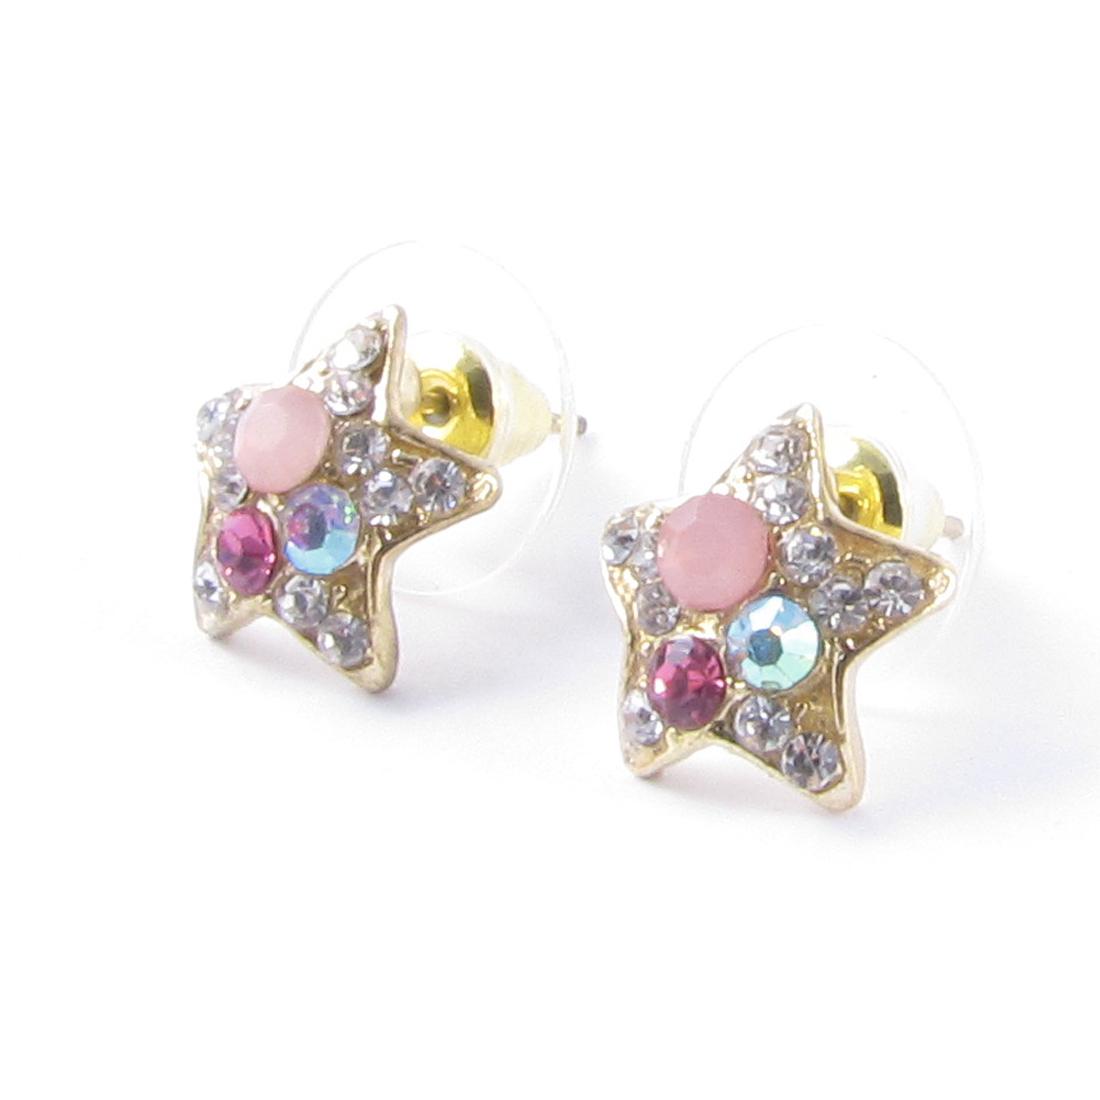 Girls Ear Ornament Glitter Rhinestones Gold Tone Star Design Stud Earrings Pair